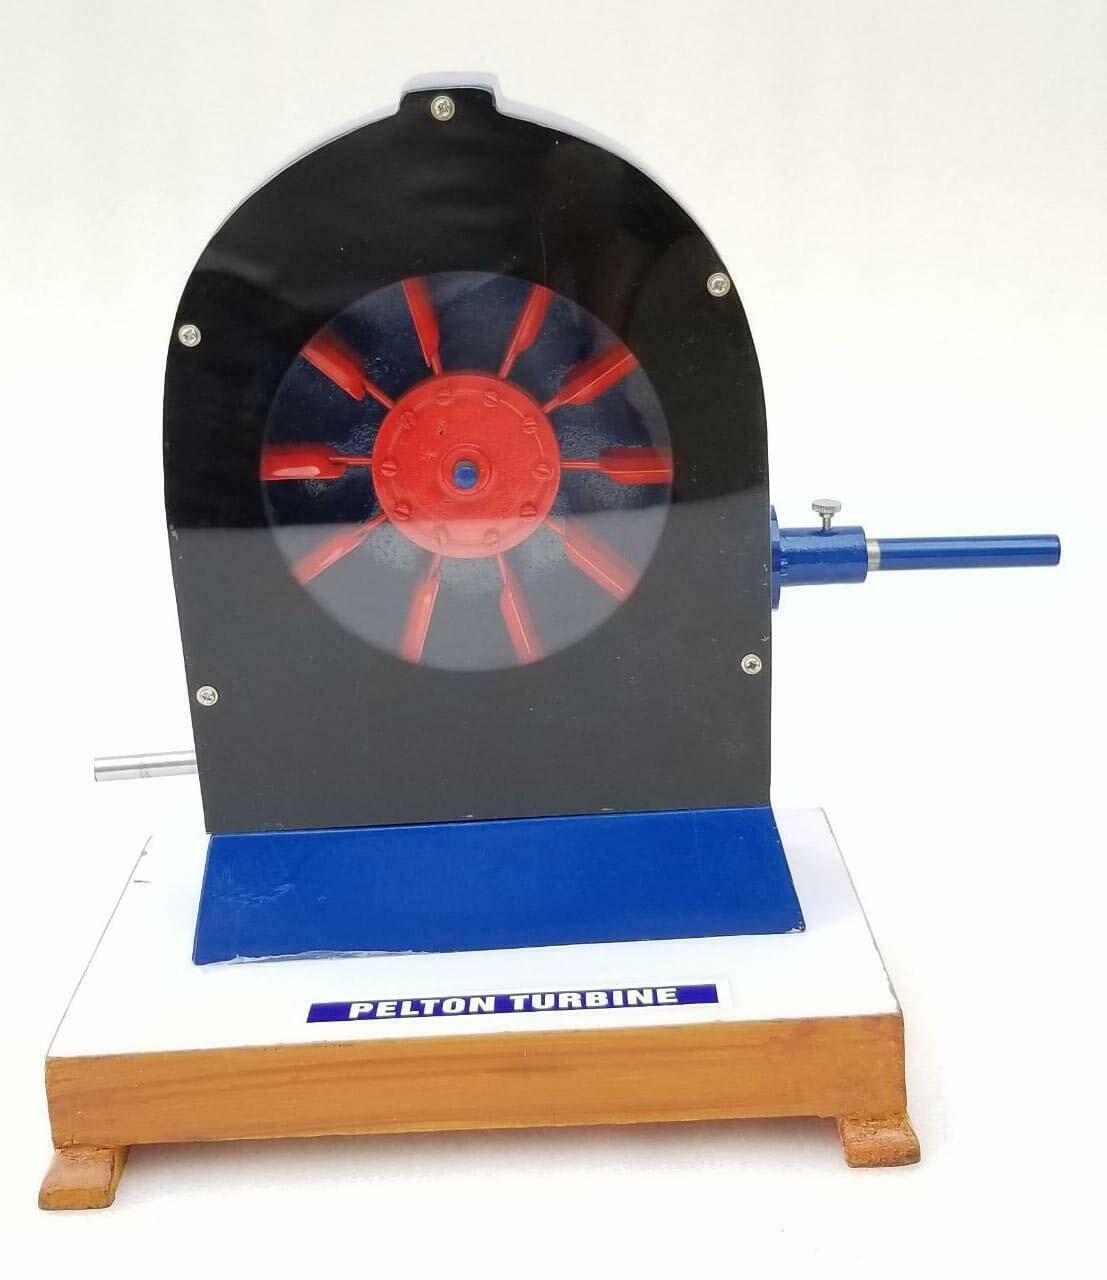 Rueda de agua Pelton para micro-generador hidro/turbina